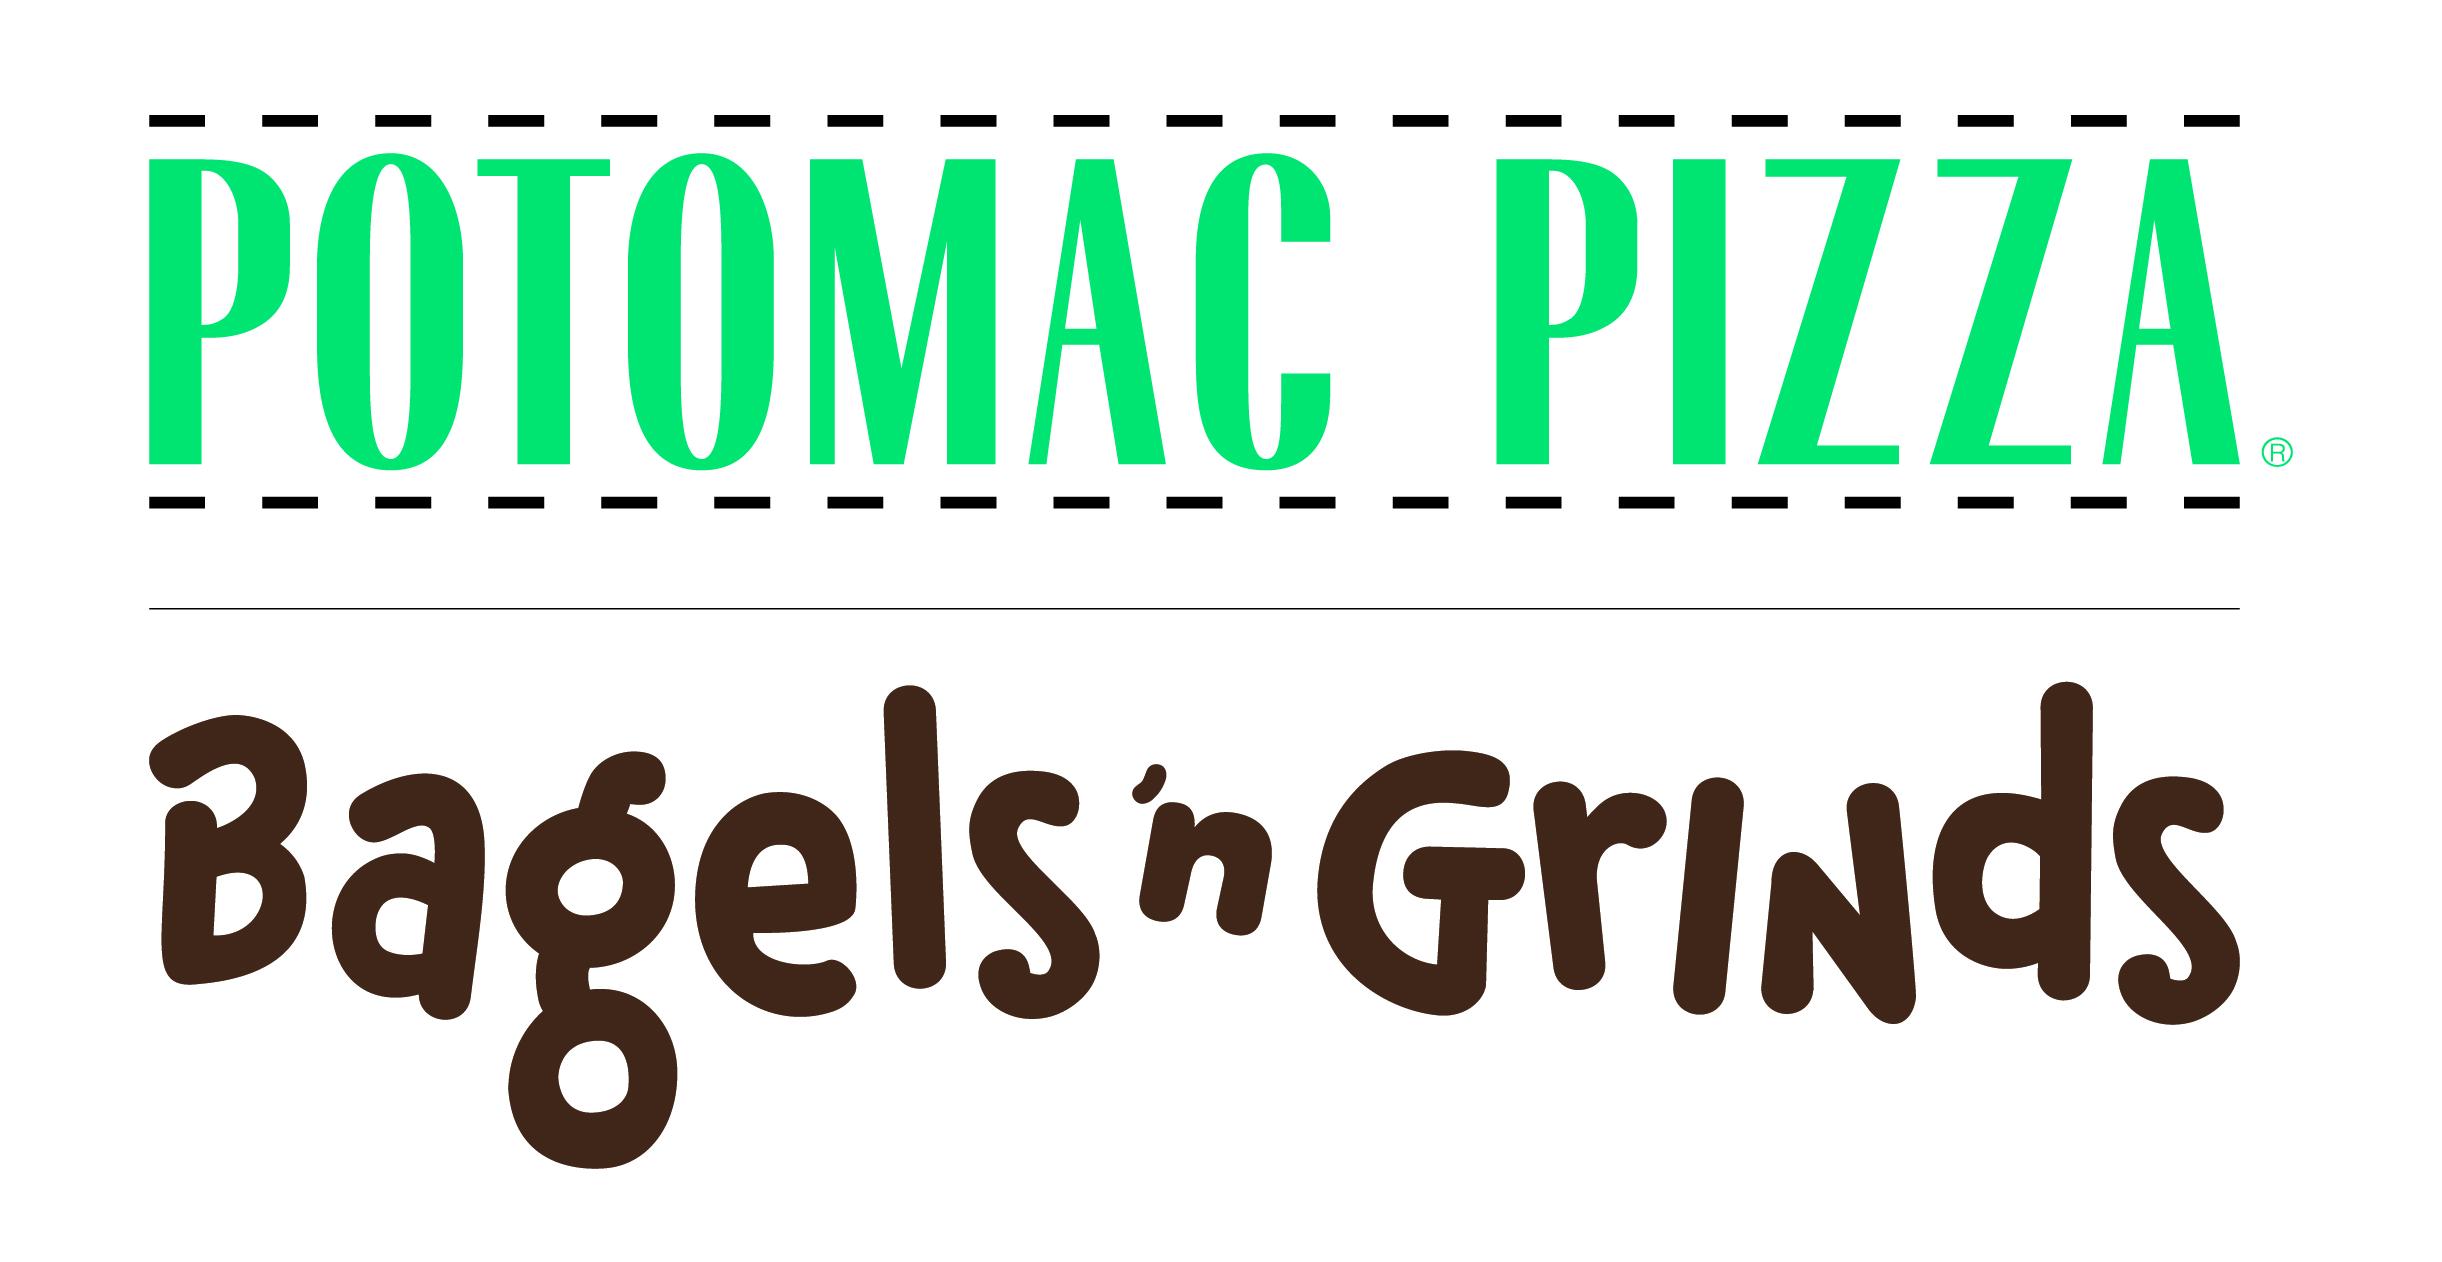 Potomac Pizza & Bagels 'n Grinds